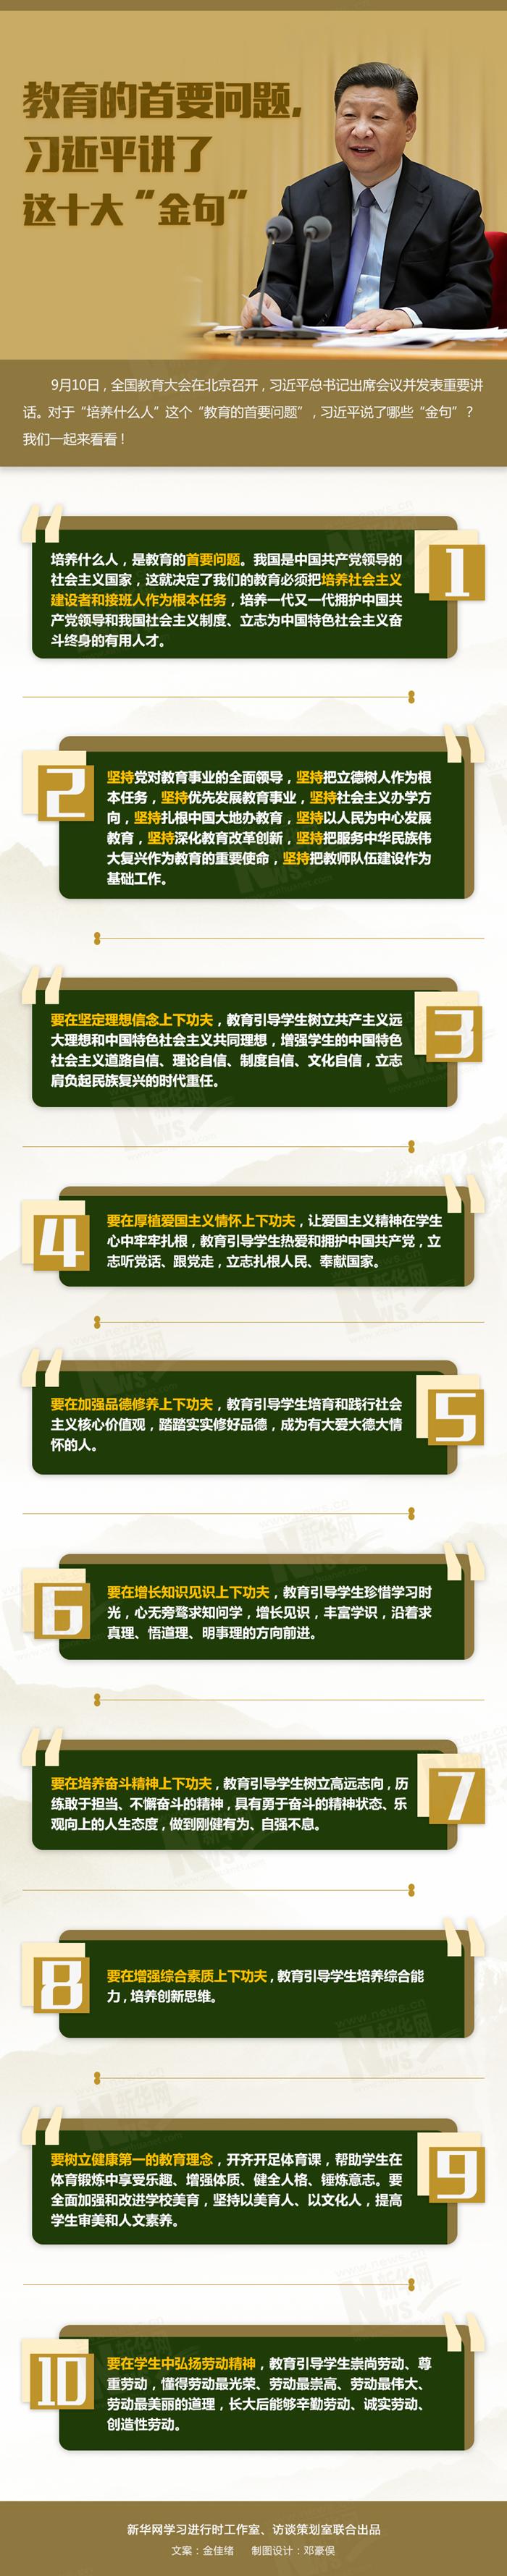 图片1_副本_副本.png